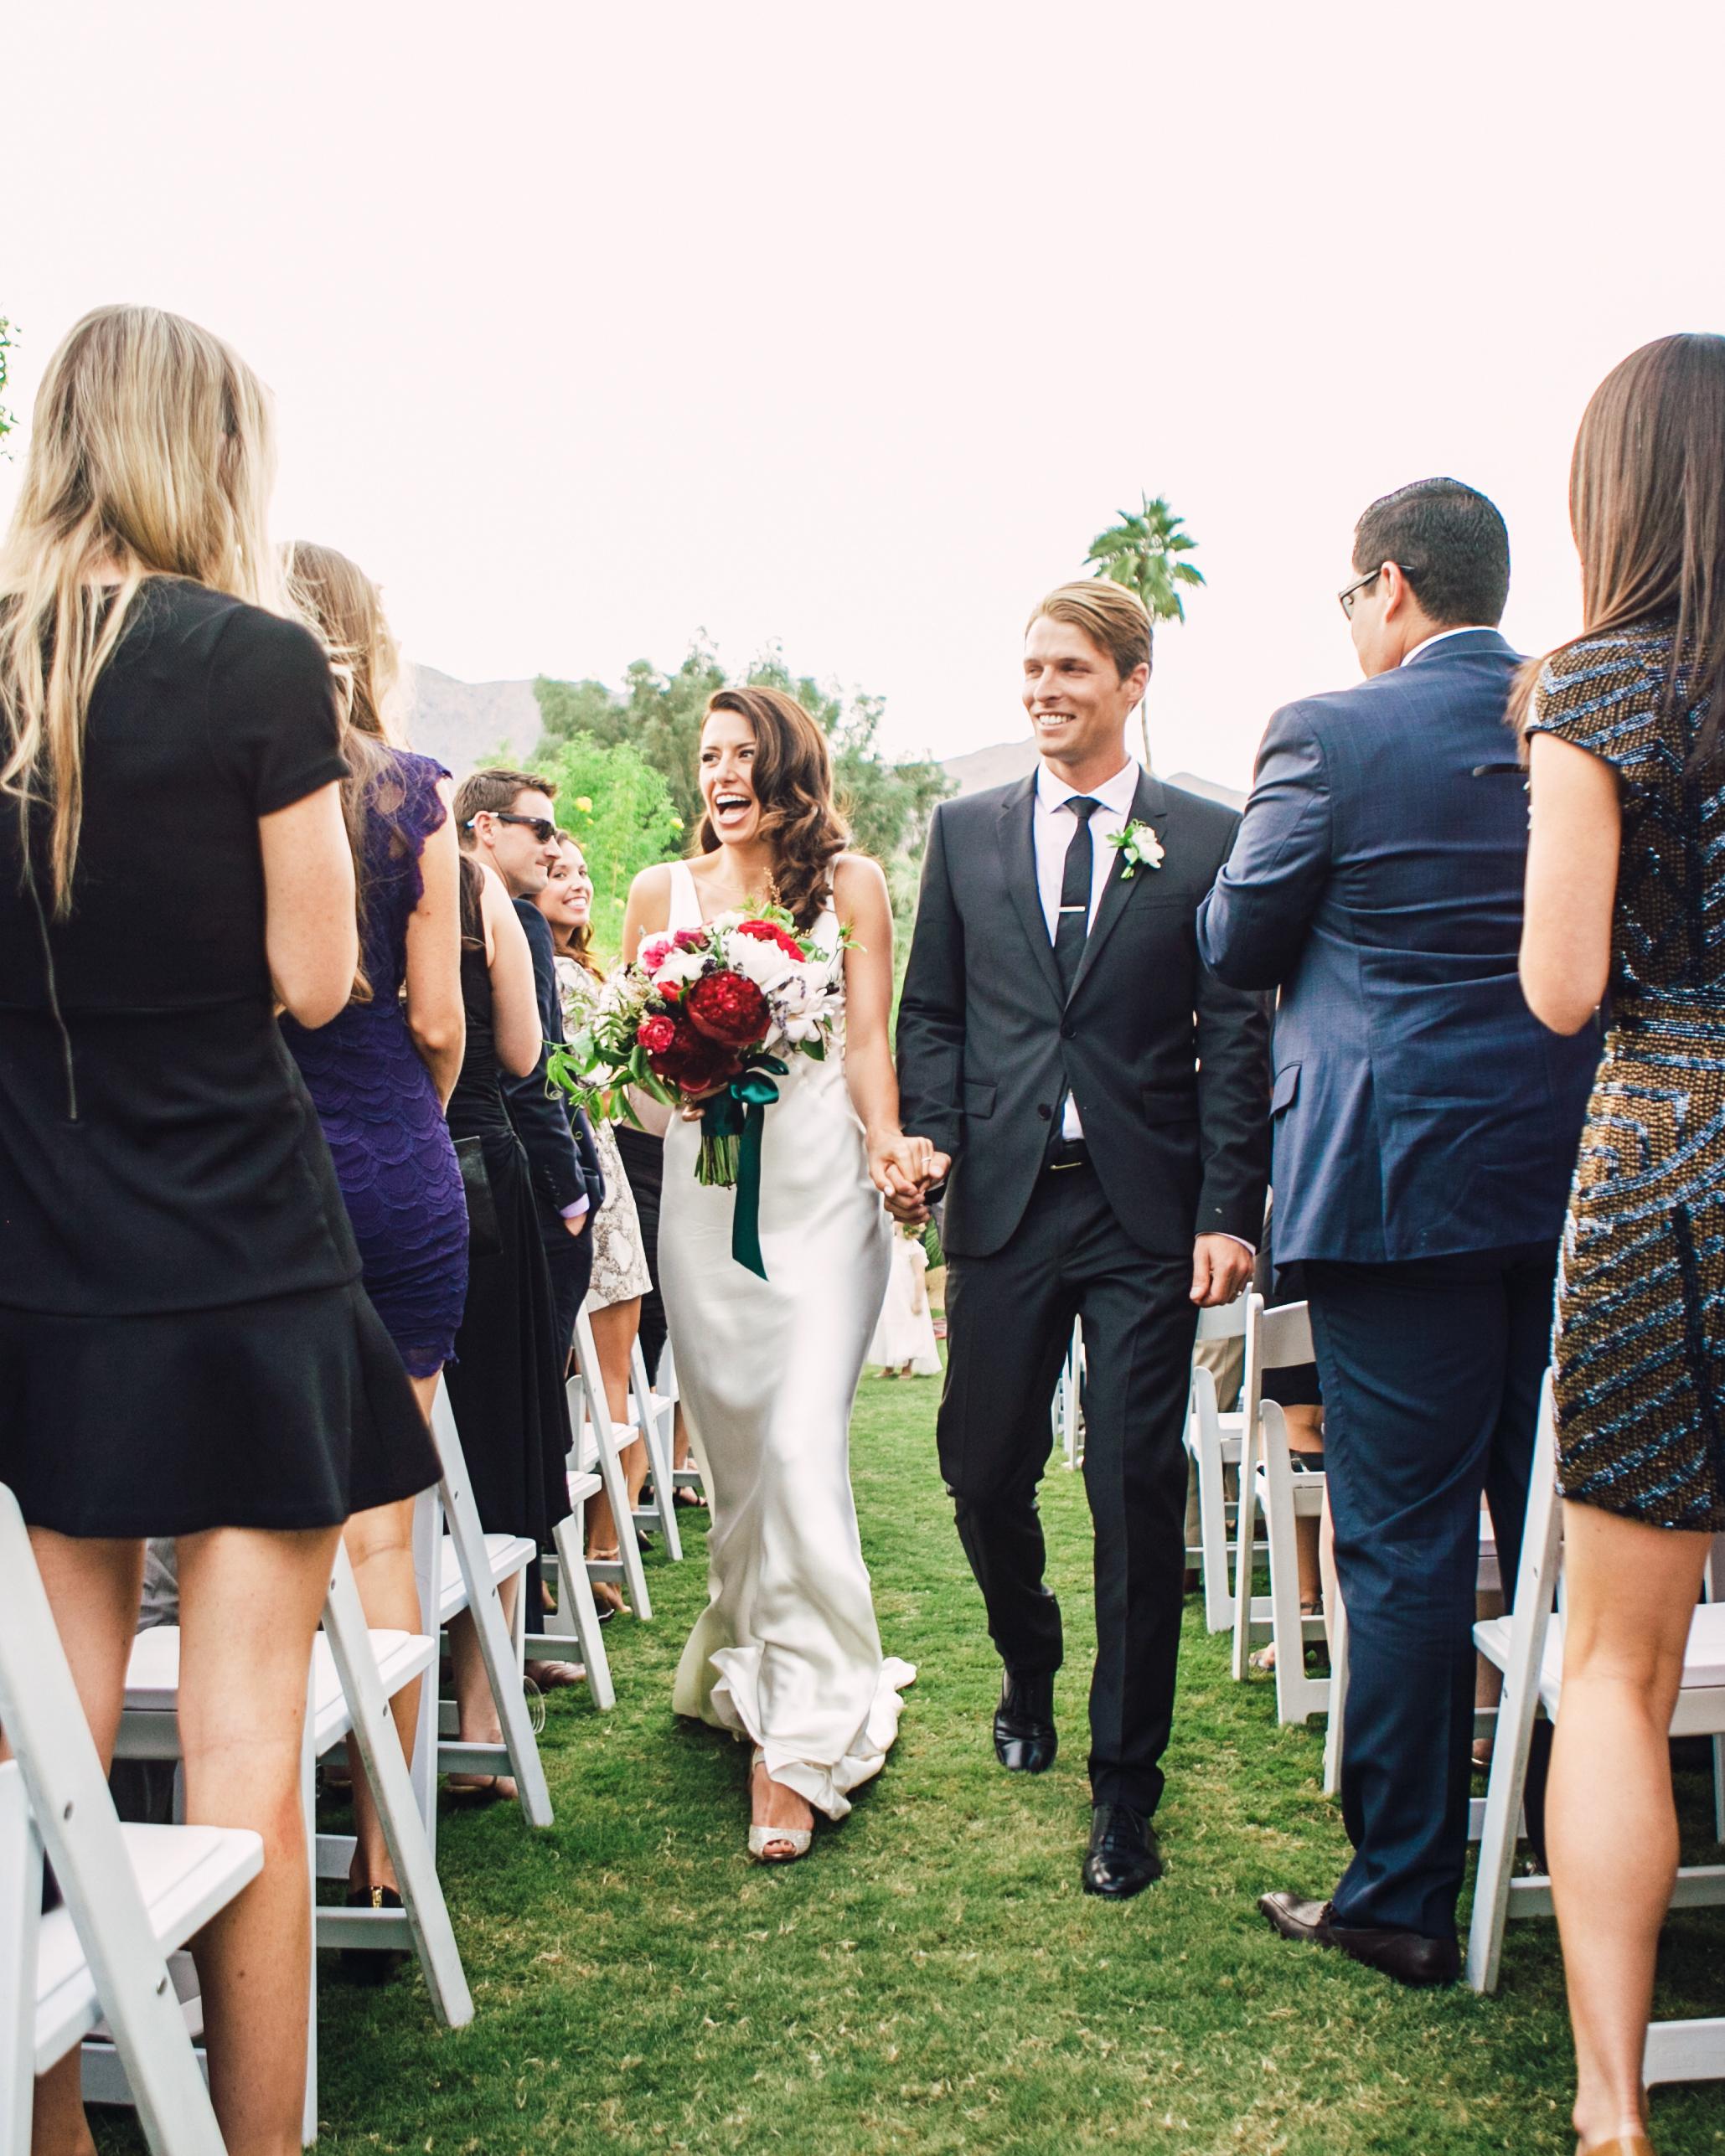 kelly_mike-wedding-ceremony1-0514.jpg